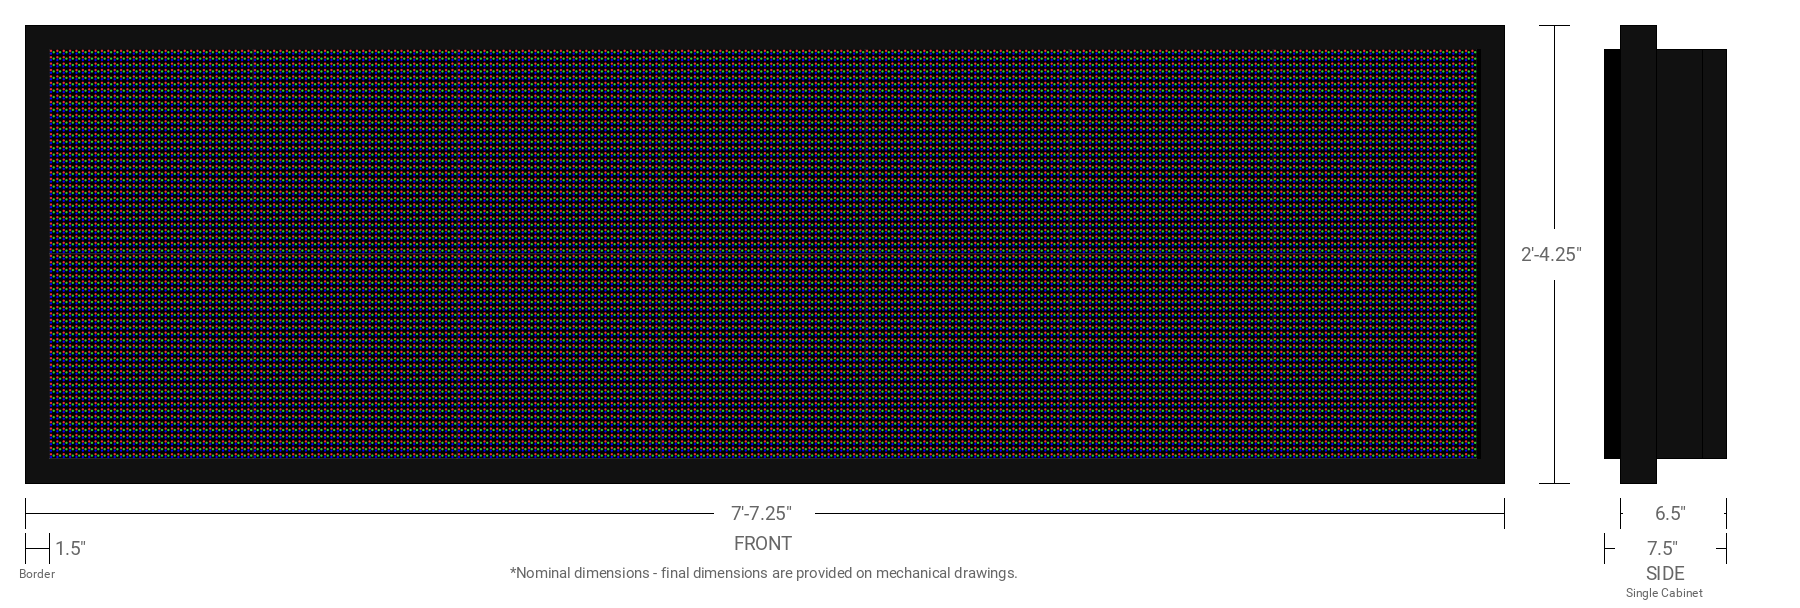 Aurora 10mm 64x224 Single Sided Full Color LED Display